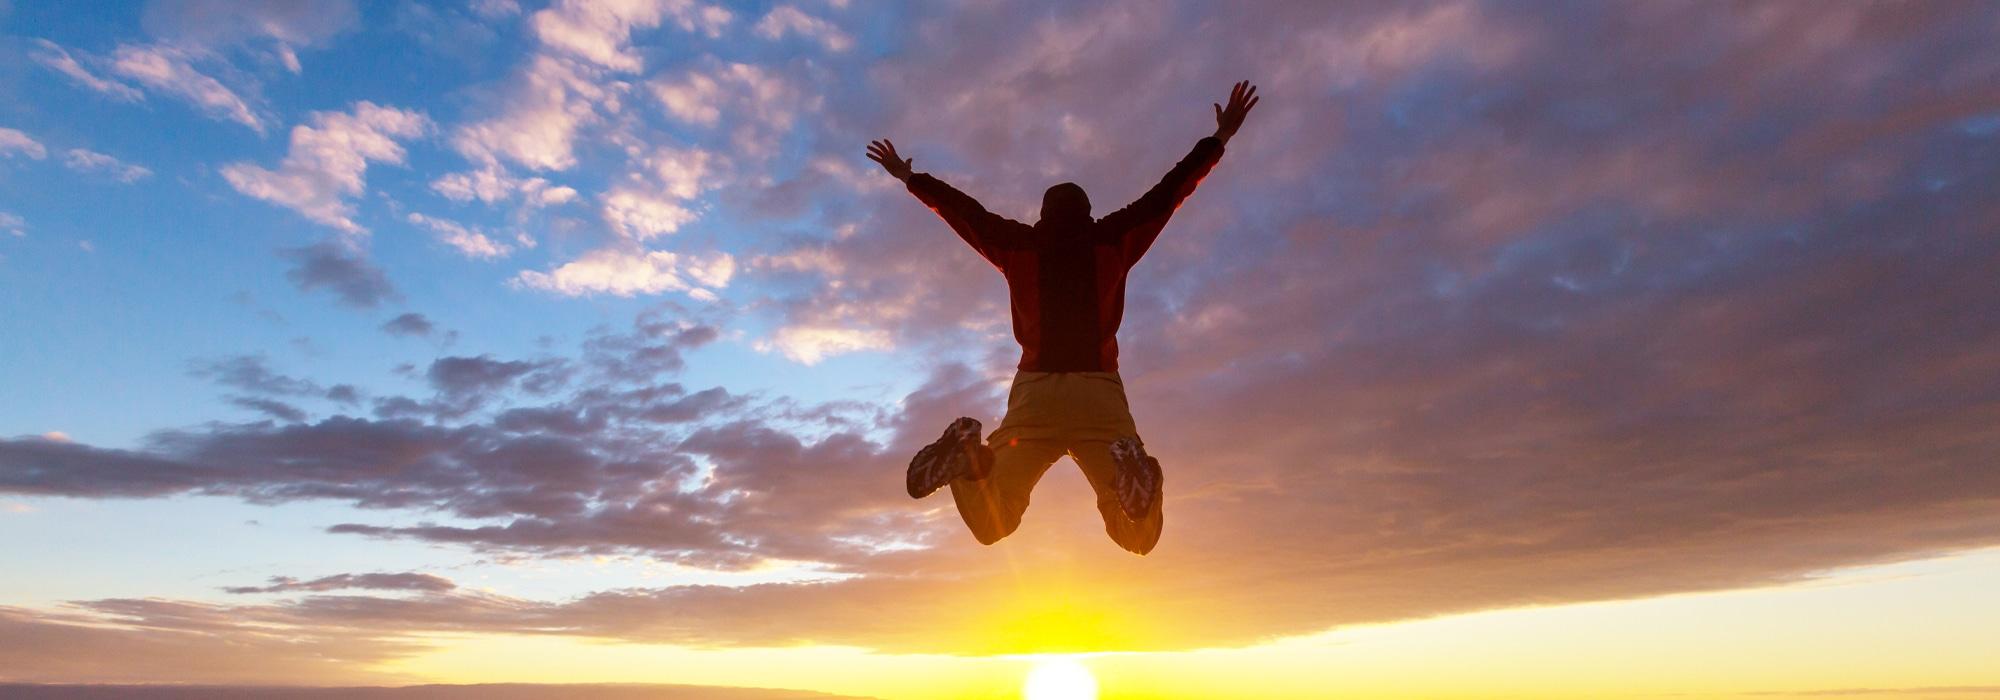 Modafinil Success in Treating ADHD